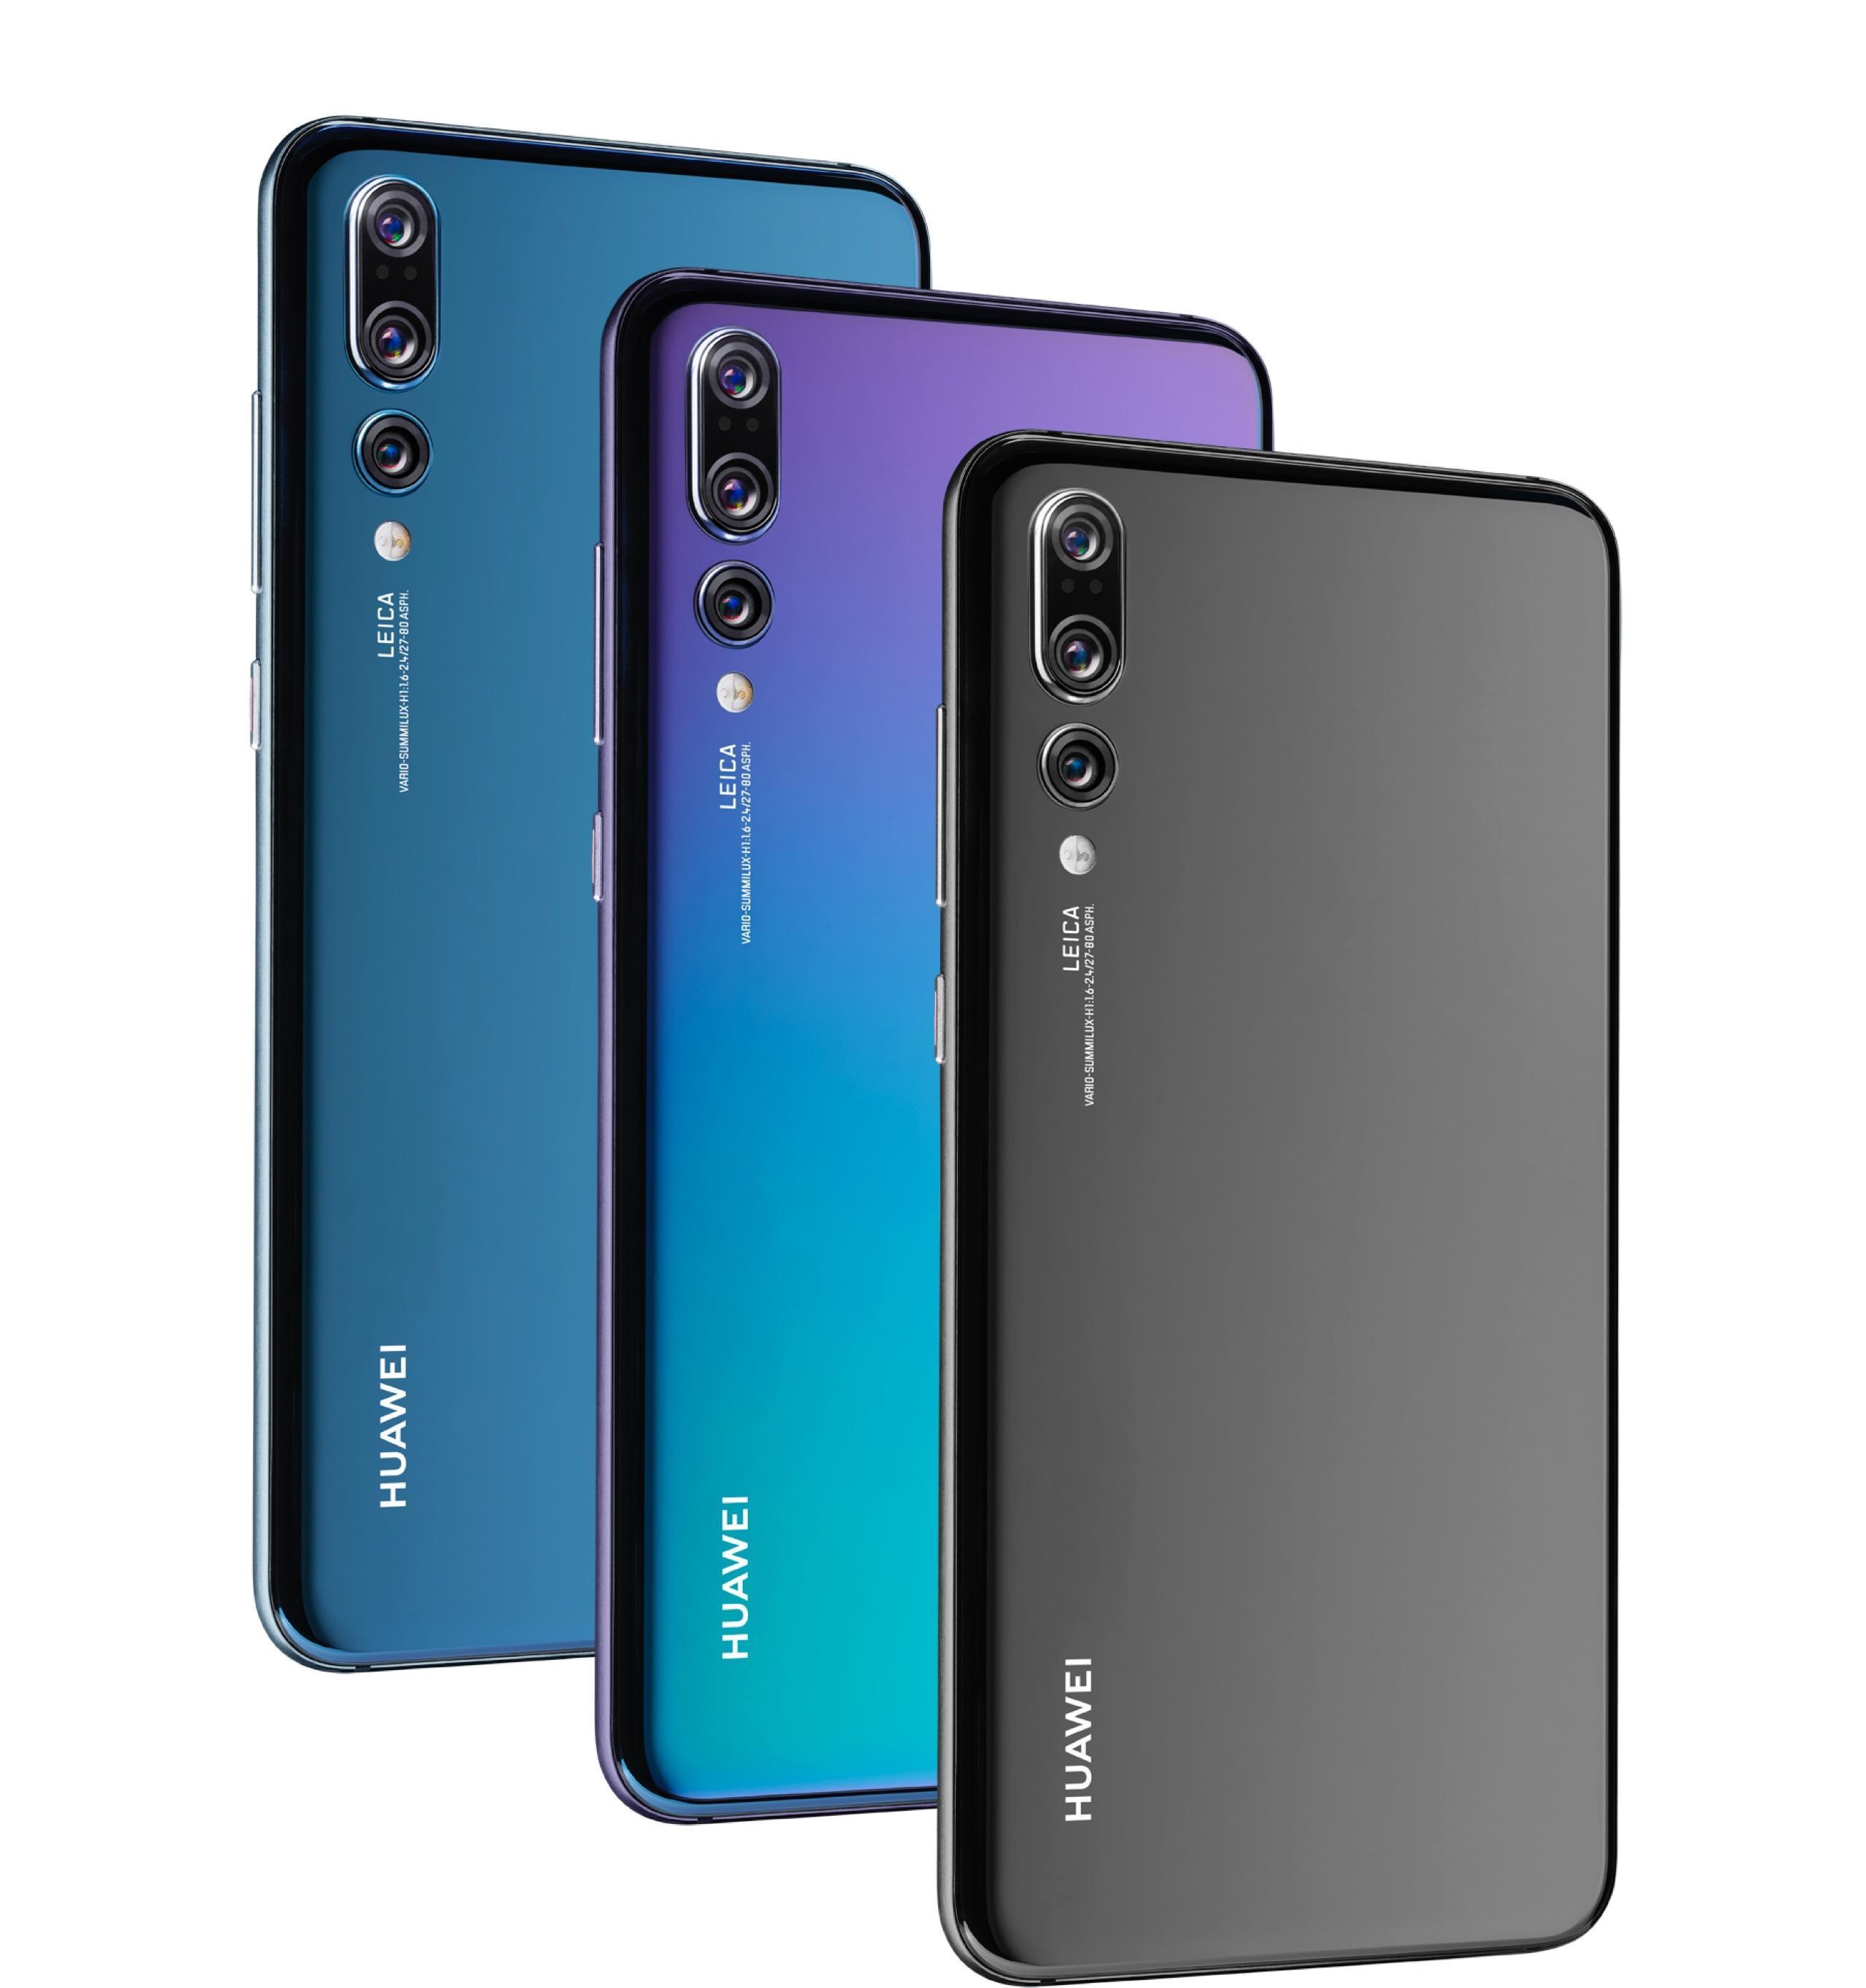 Huawei P20 Pro Speicherkarte